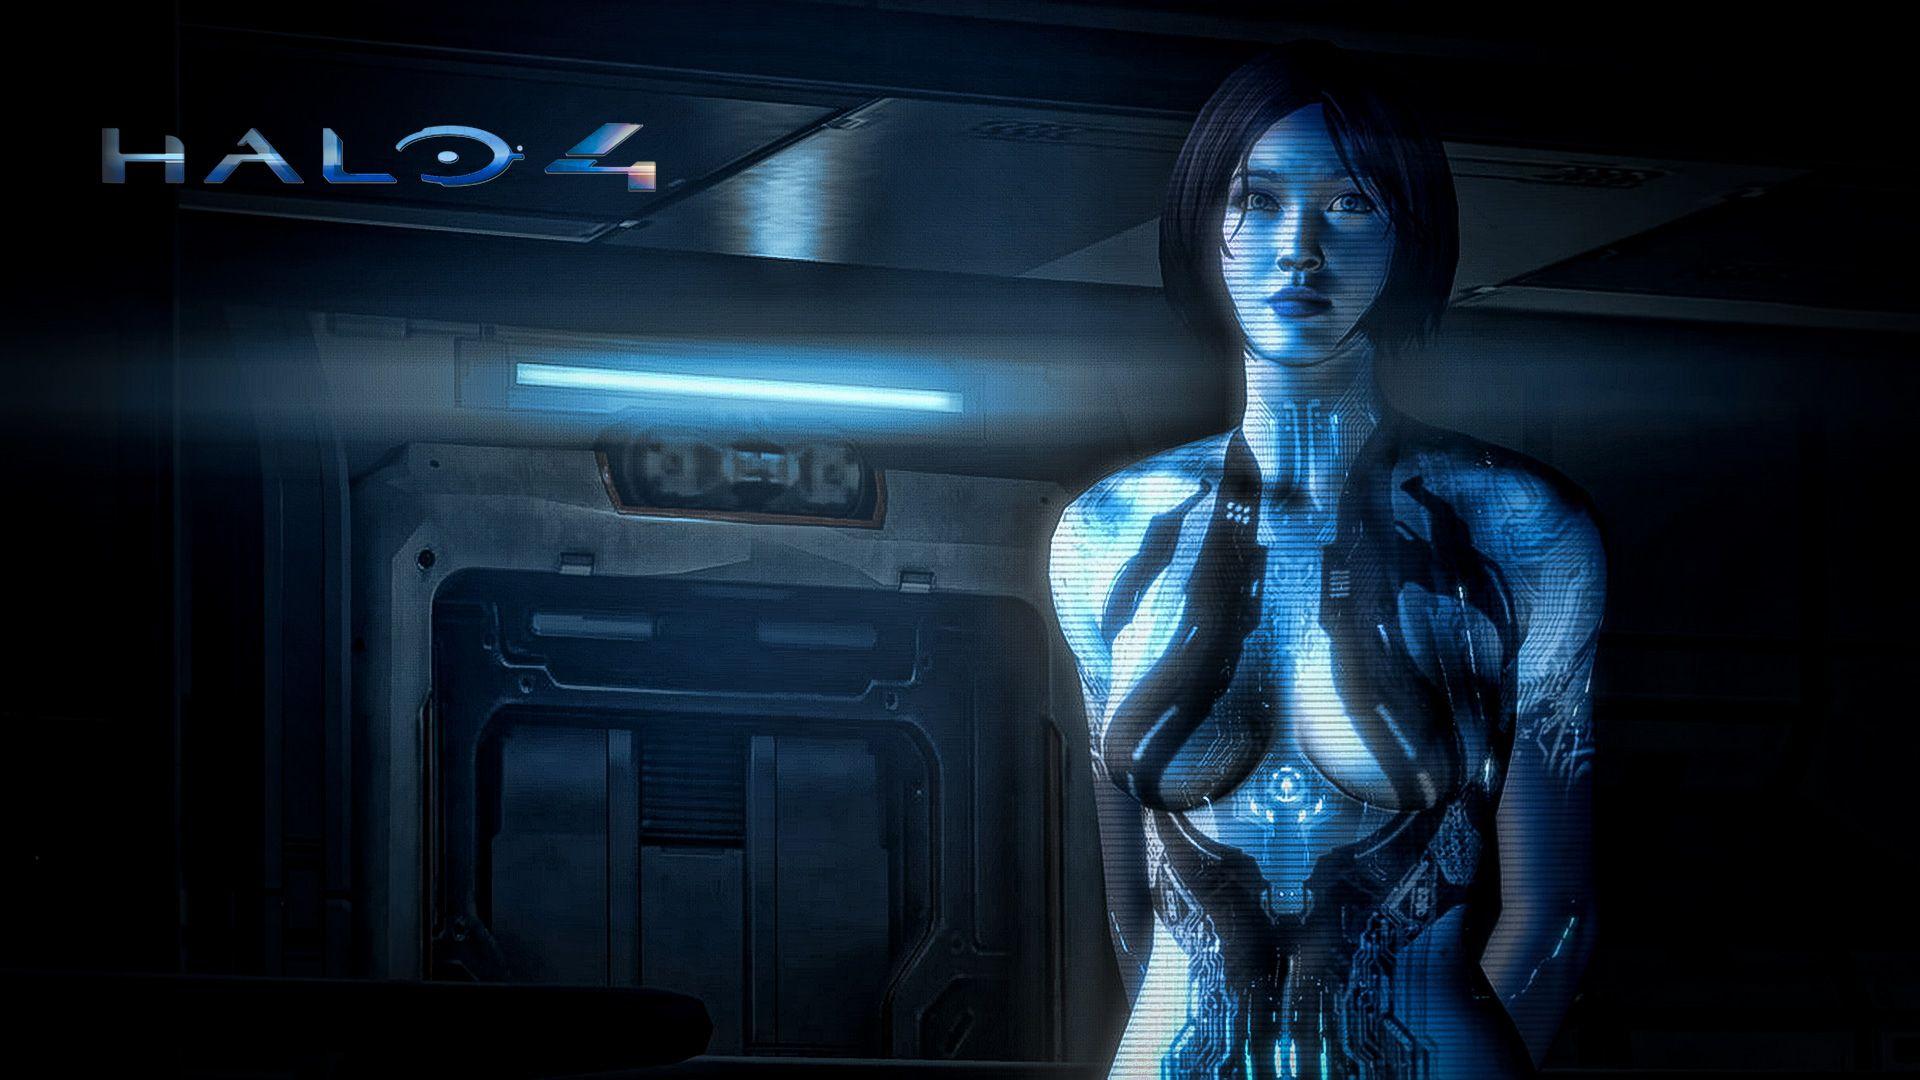 Cortana Halo 4 Wallpaper Hd